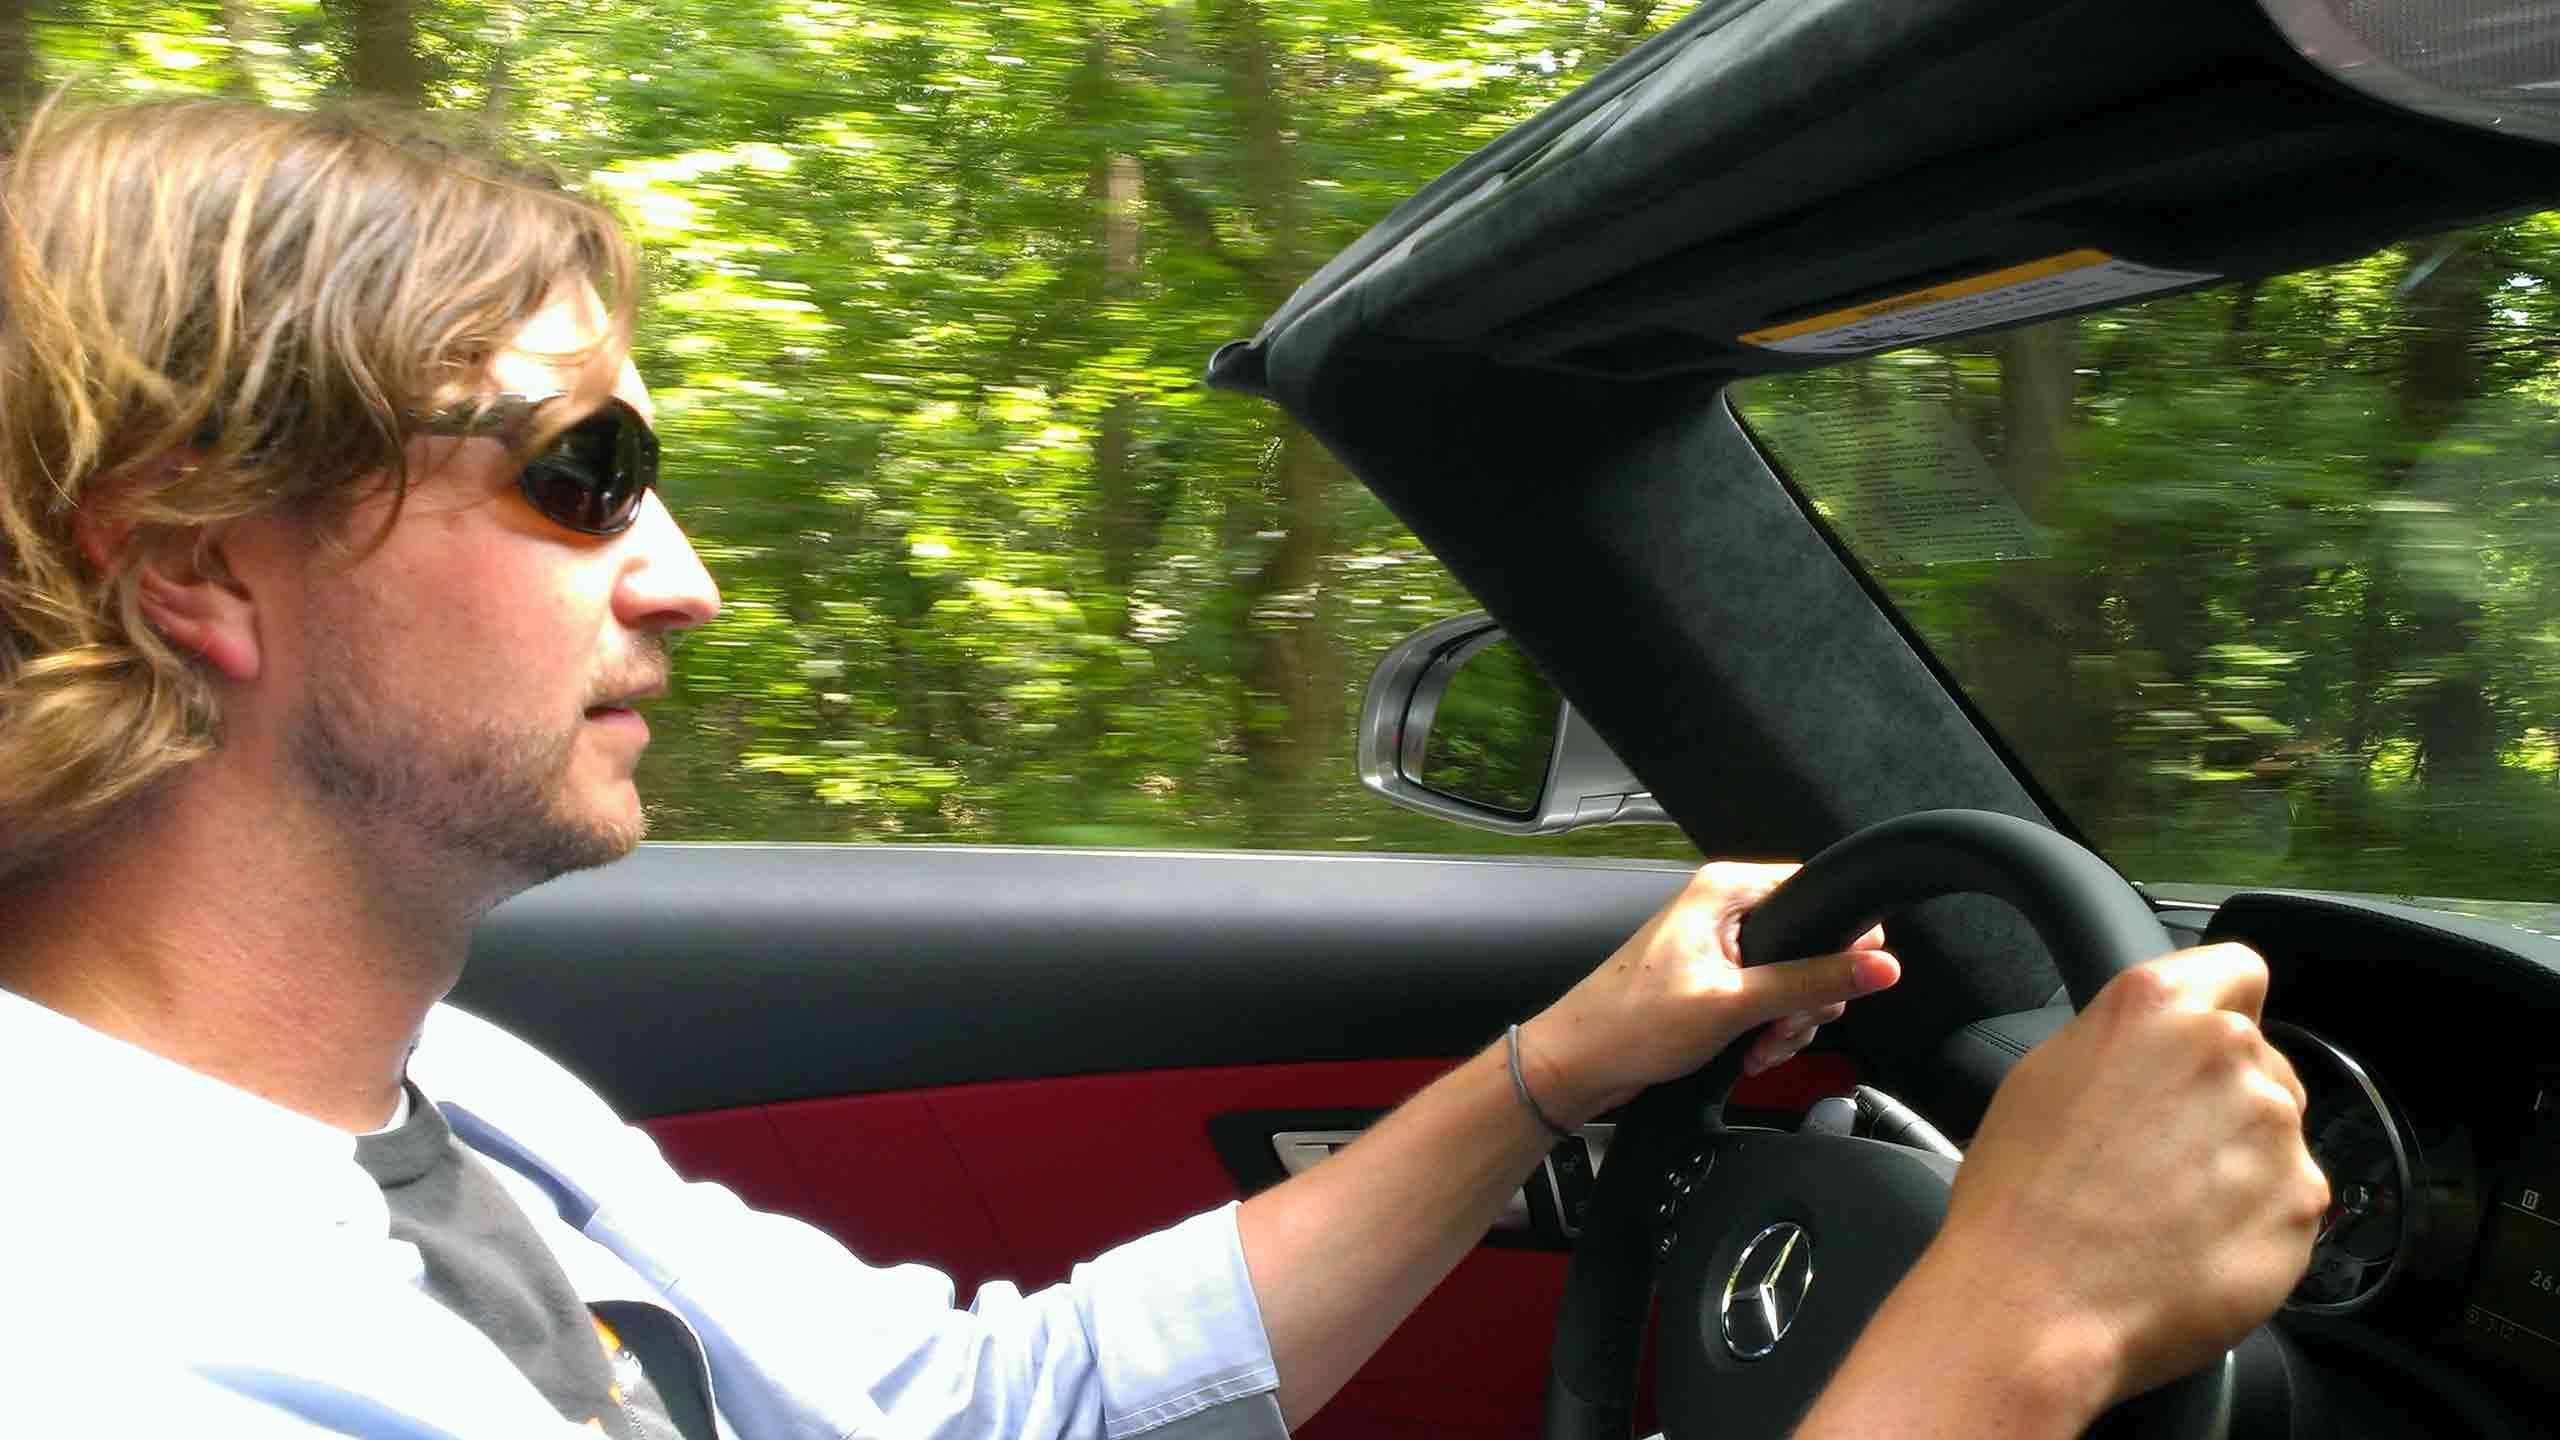 Driving an SLS AMG Roadster